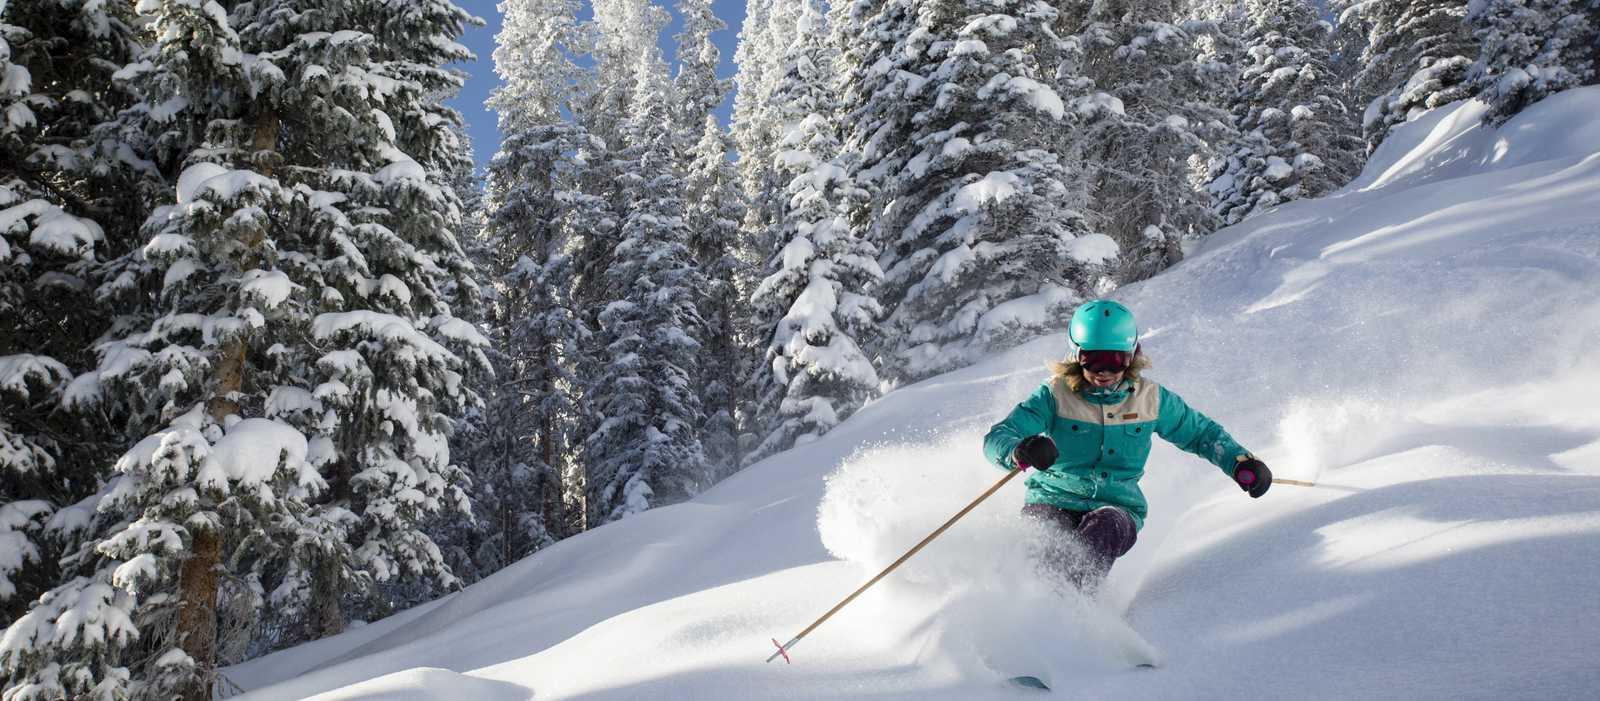 Abfahrt im Powderschnee in Aspen, Colorado